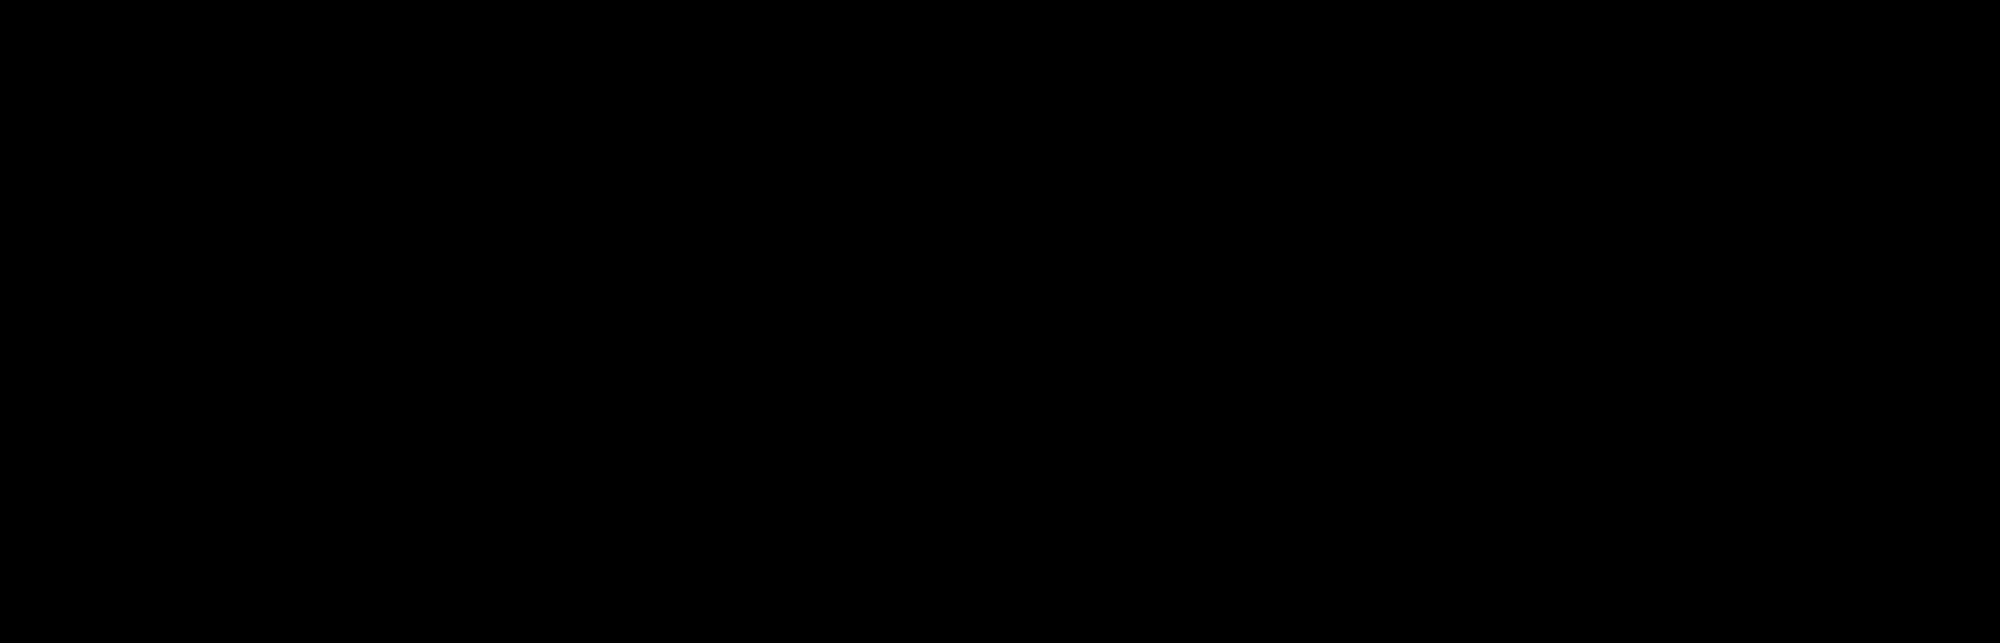 JOANNA RIEDL-logo (5).png